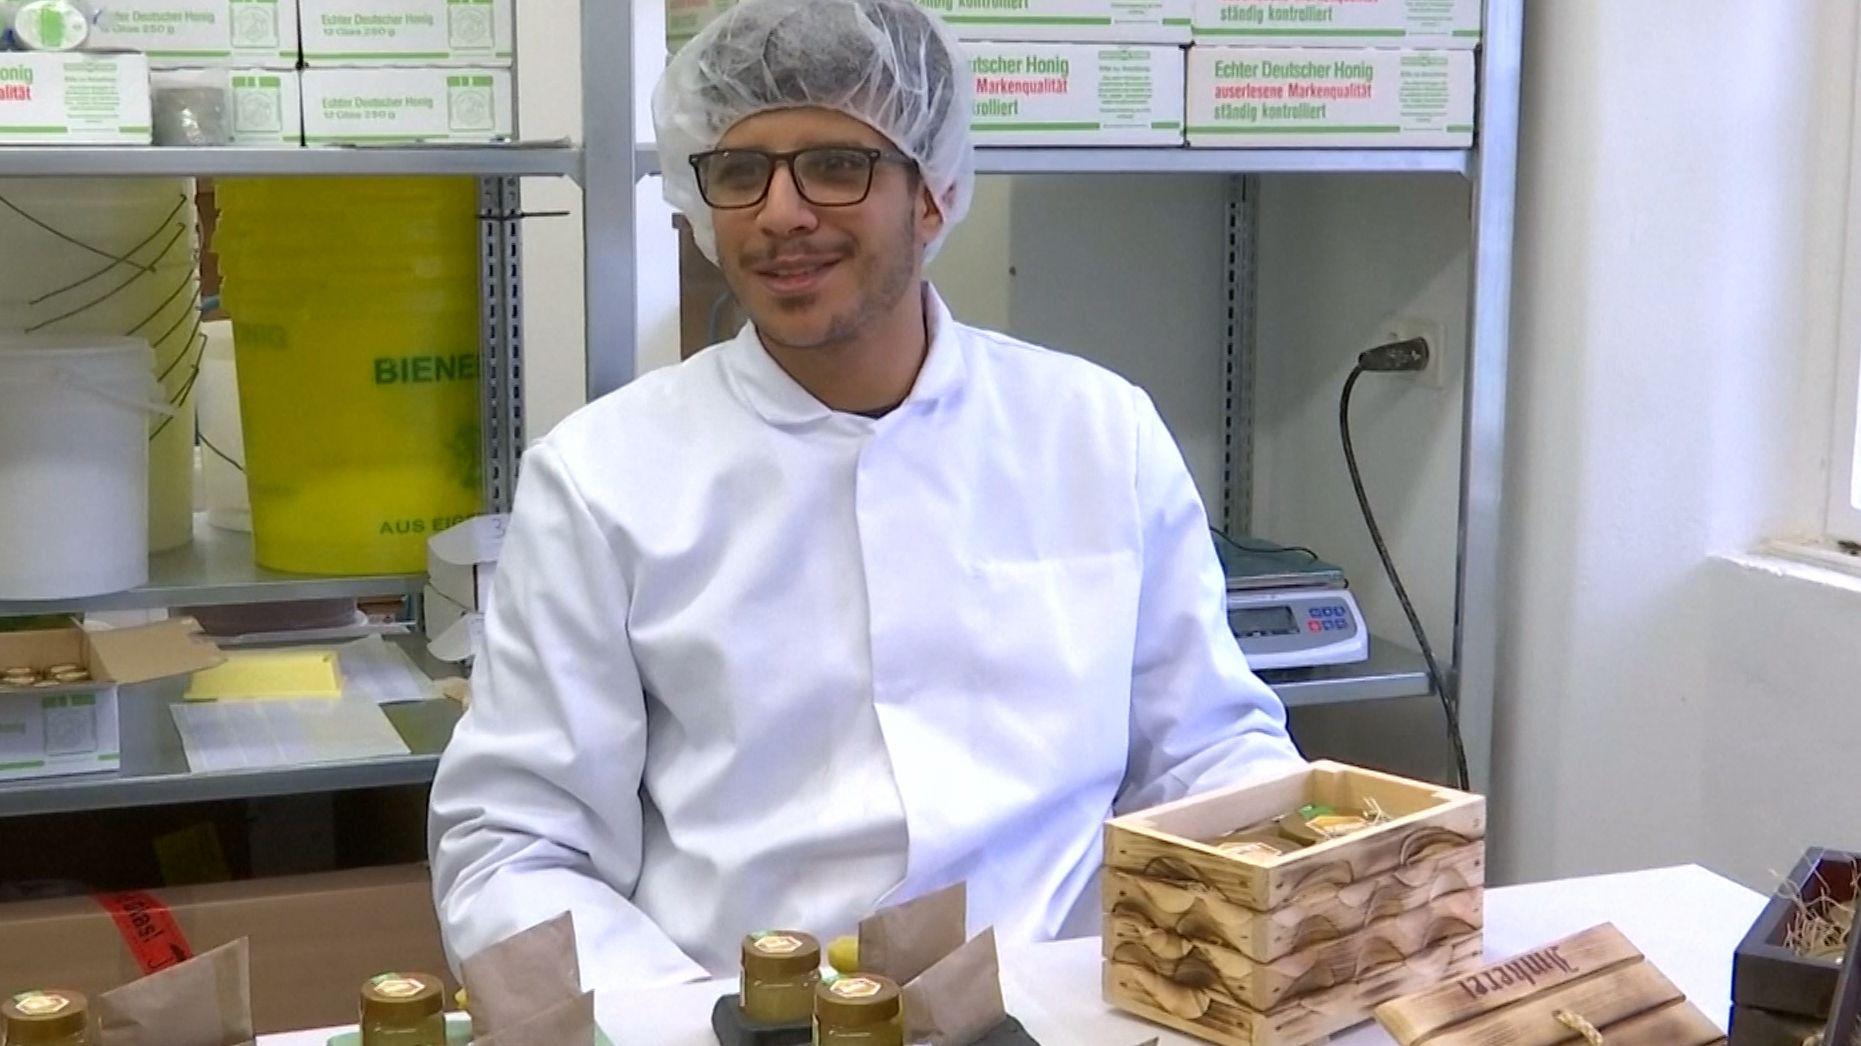 Häftling Mohamed nimmt in der JVA Remscheid am Bienen-Projekt teil